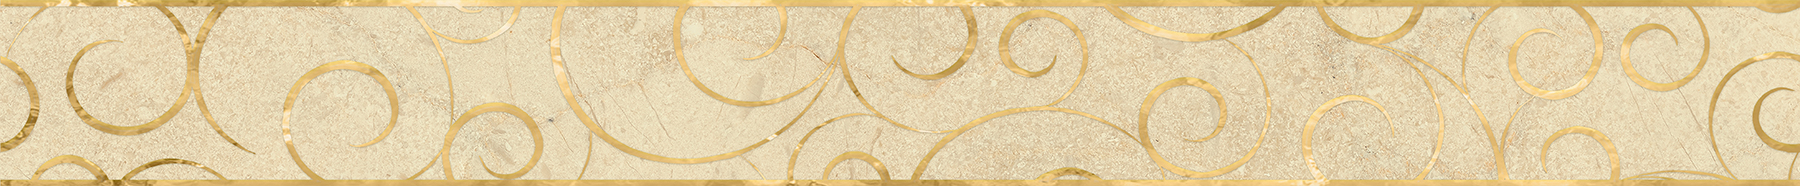 Миланезе дизайн Бордюр Флорал крема 1506-0156 6х60 бордюр настенный 6х60 3 миланезе дизайн флорал крема